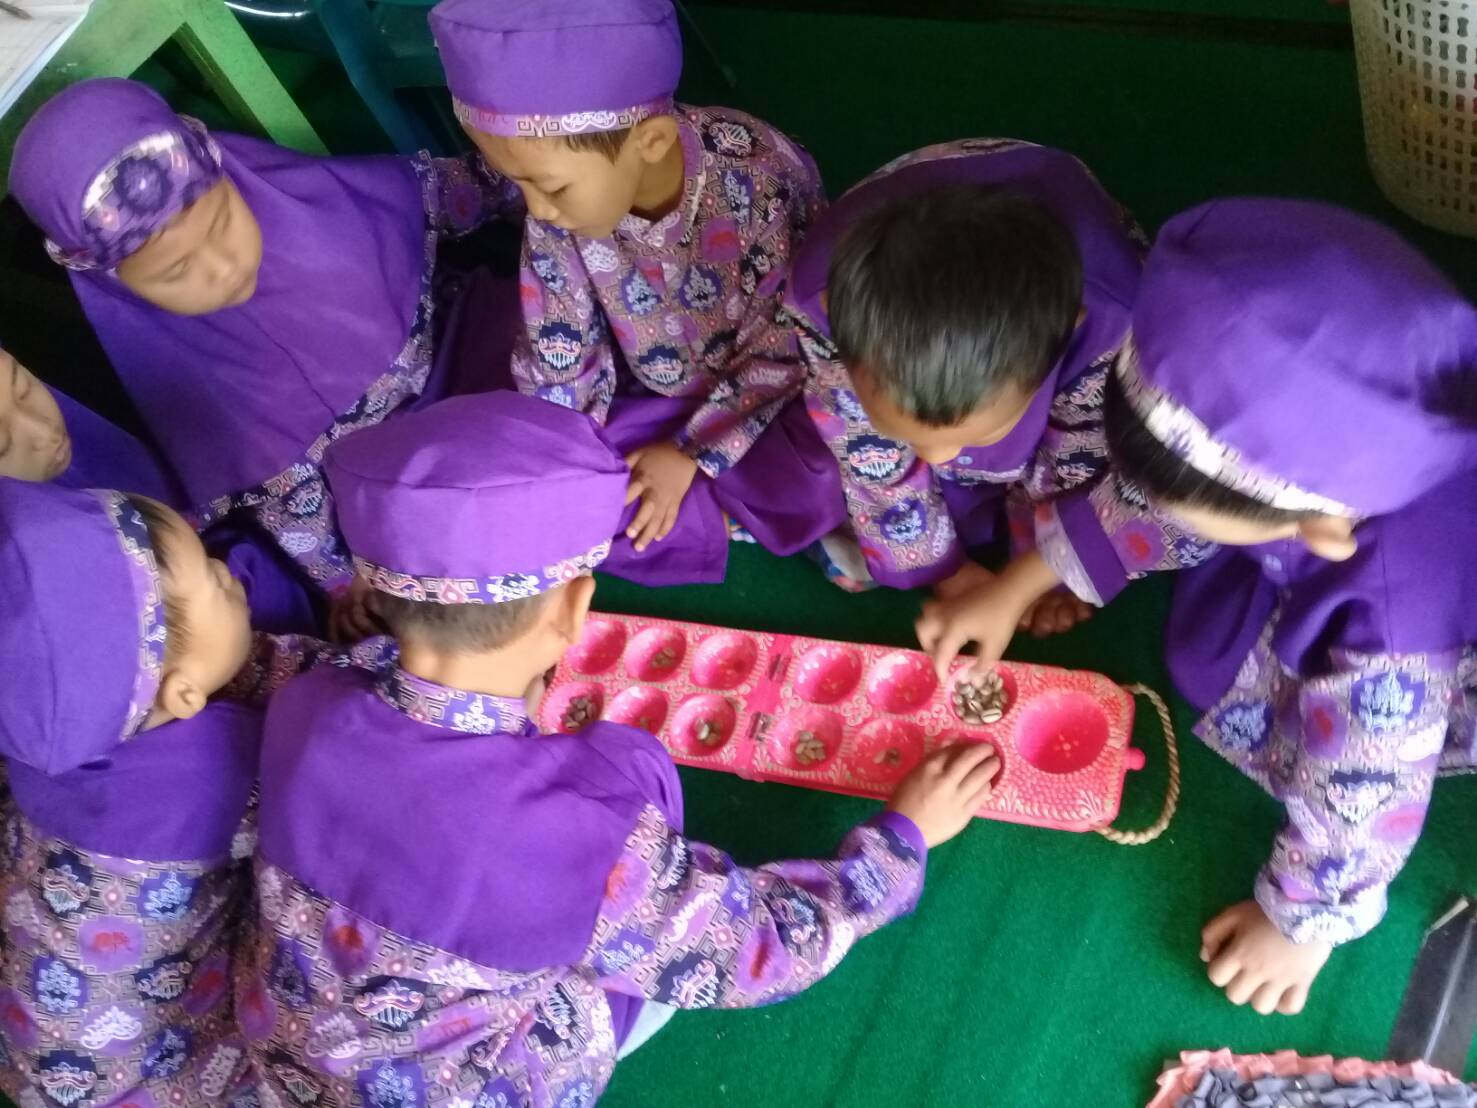 Berkas Permainan Congkak Jpg Wikipedia Bahasa Indonesia Ensiklopedia Bebas